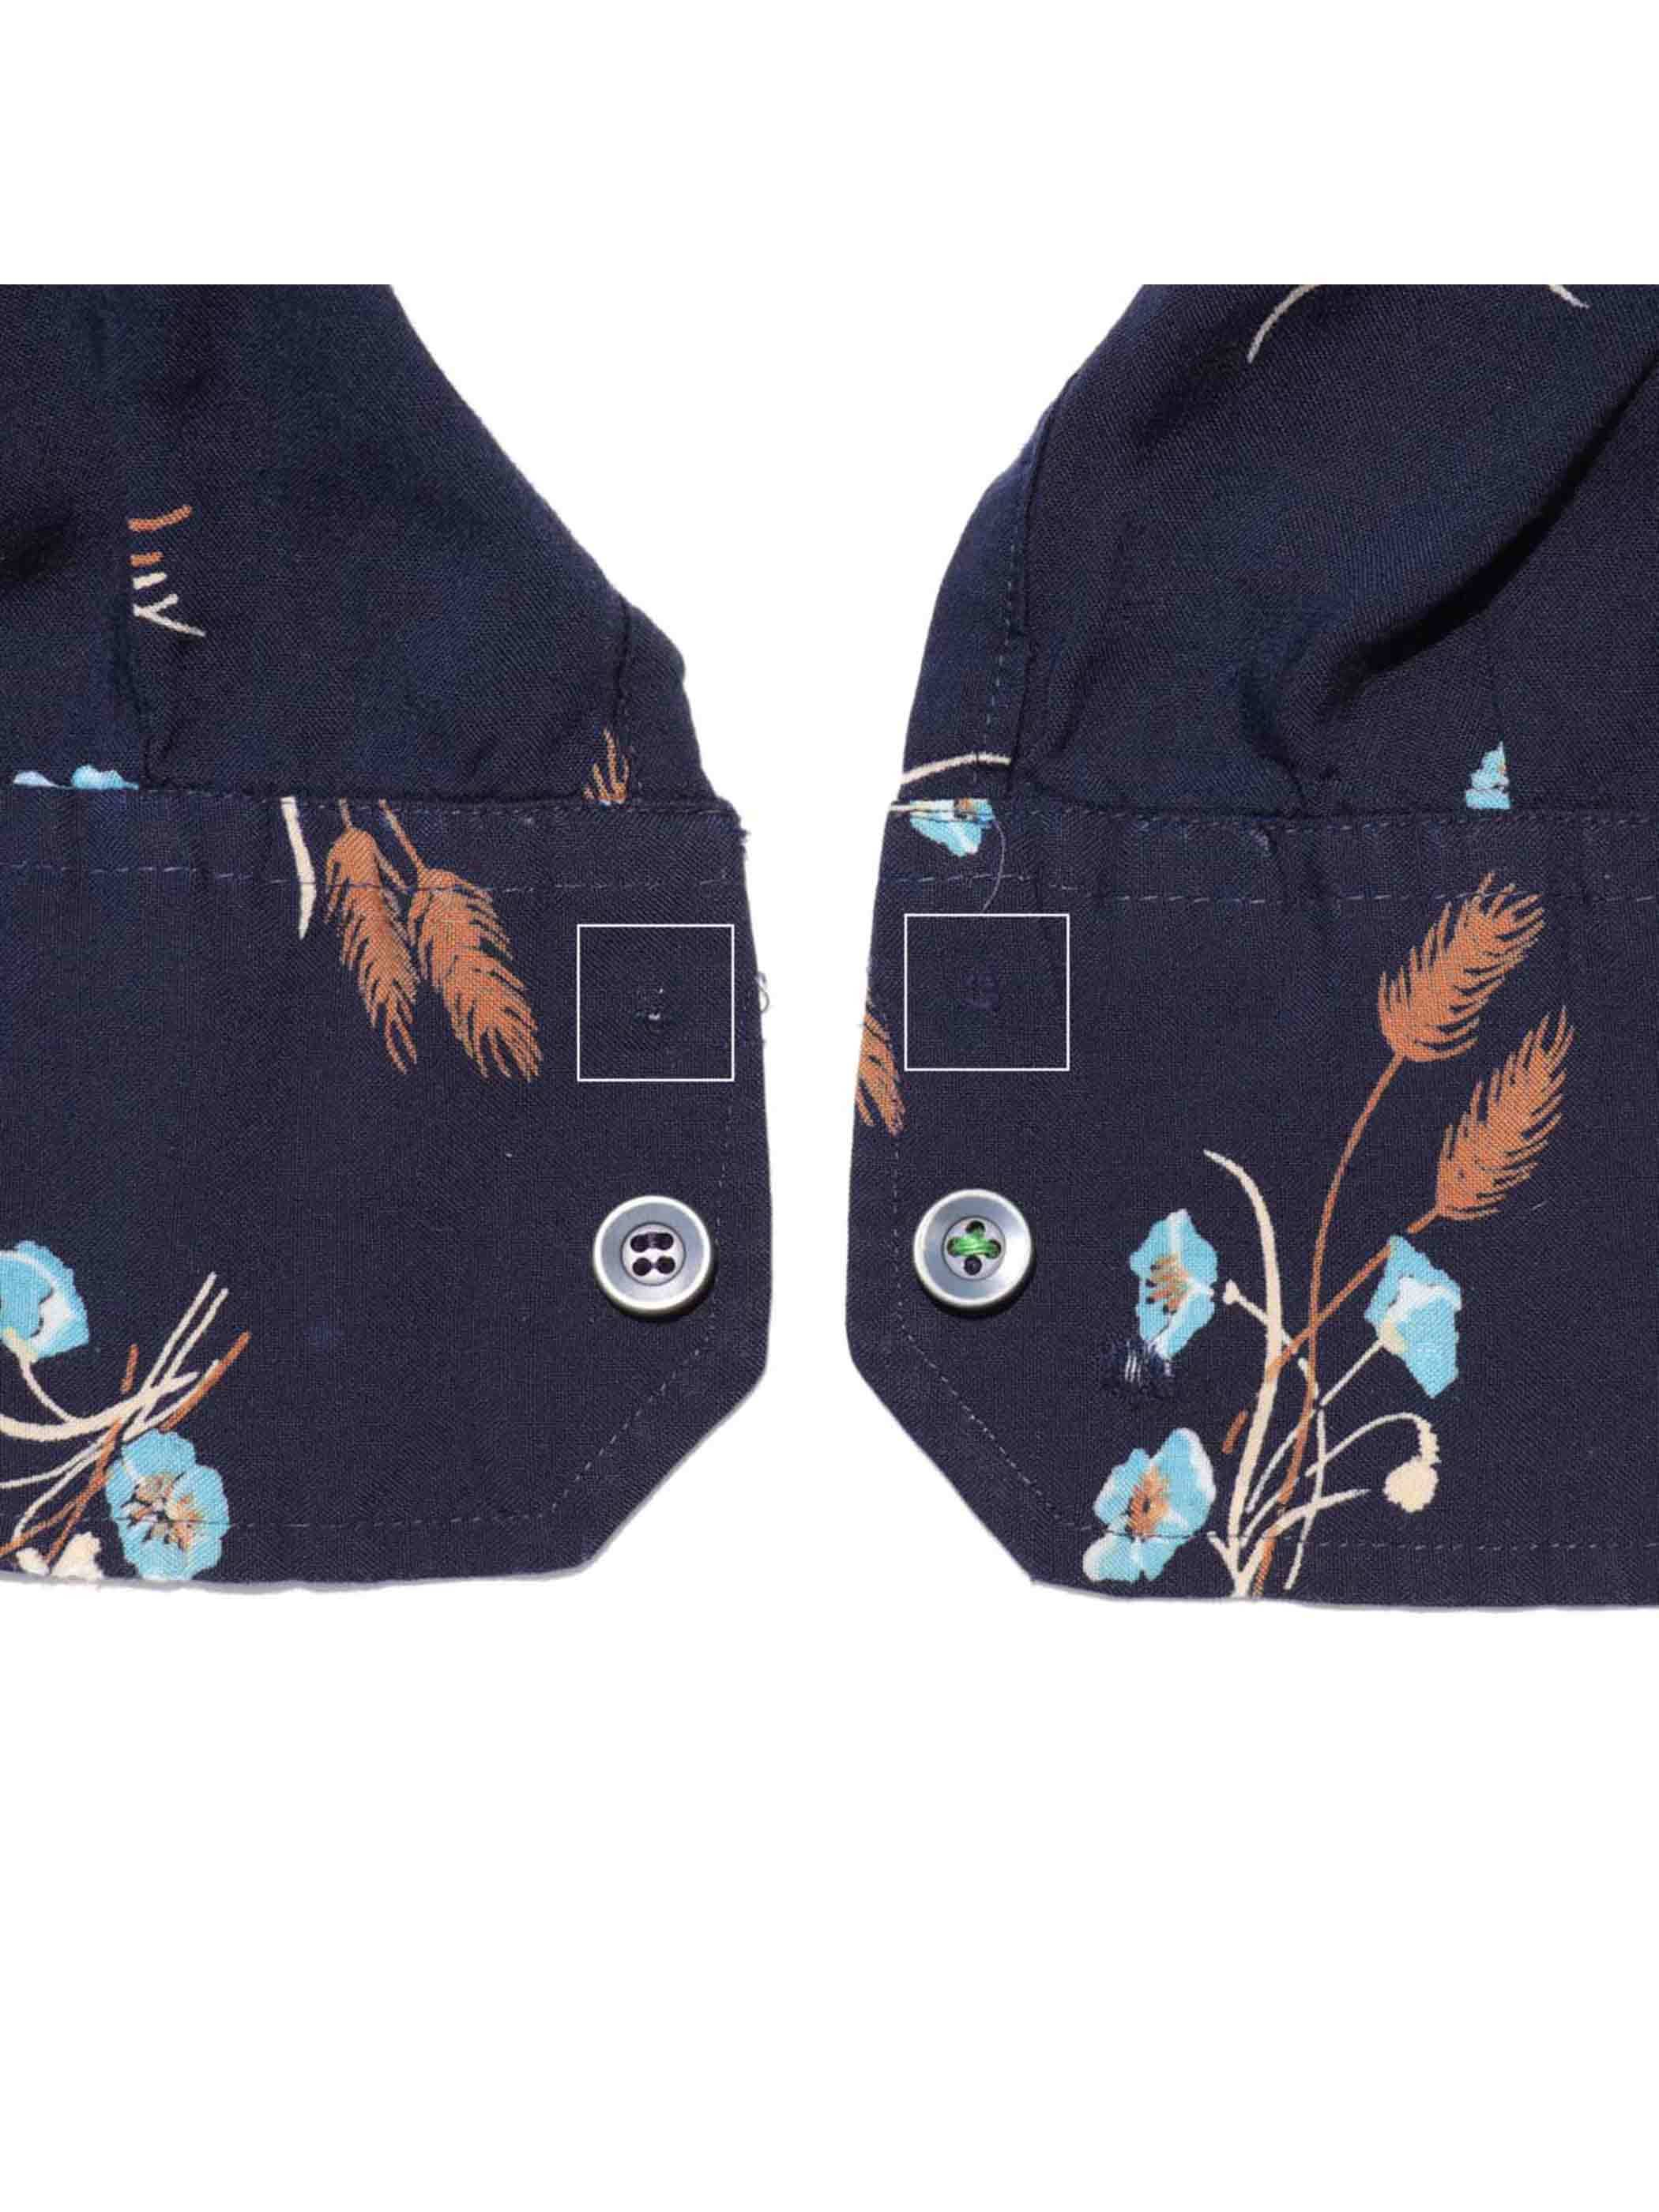 70's UNKNOWN ケシの花柄 レーヨンシャツ [16-1/2]